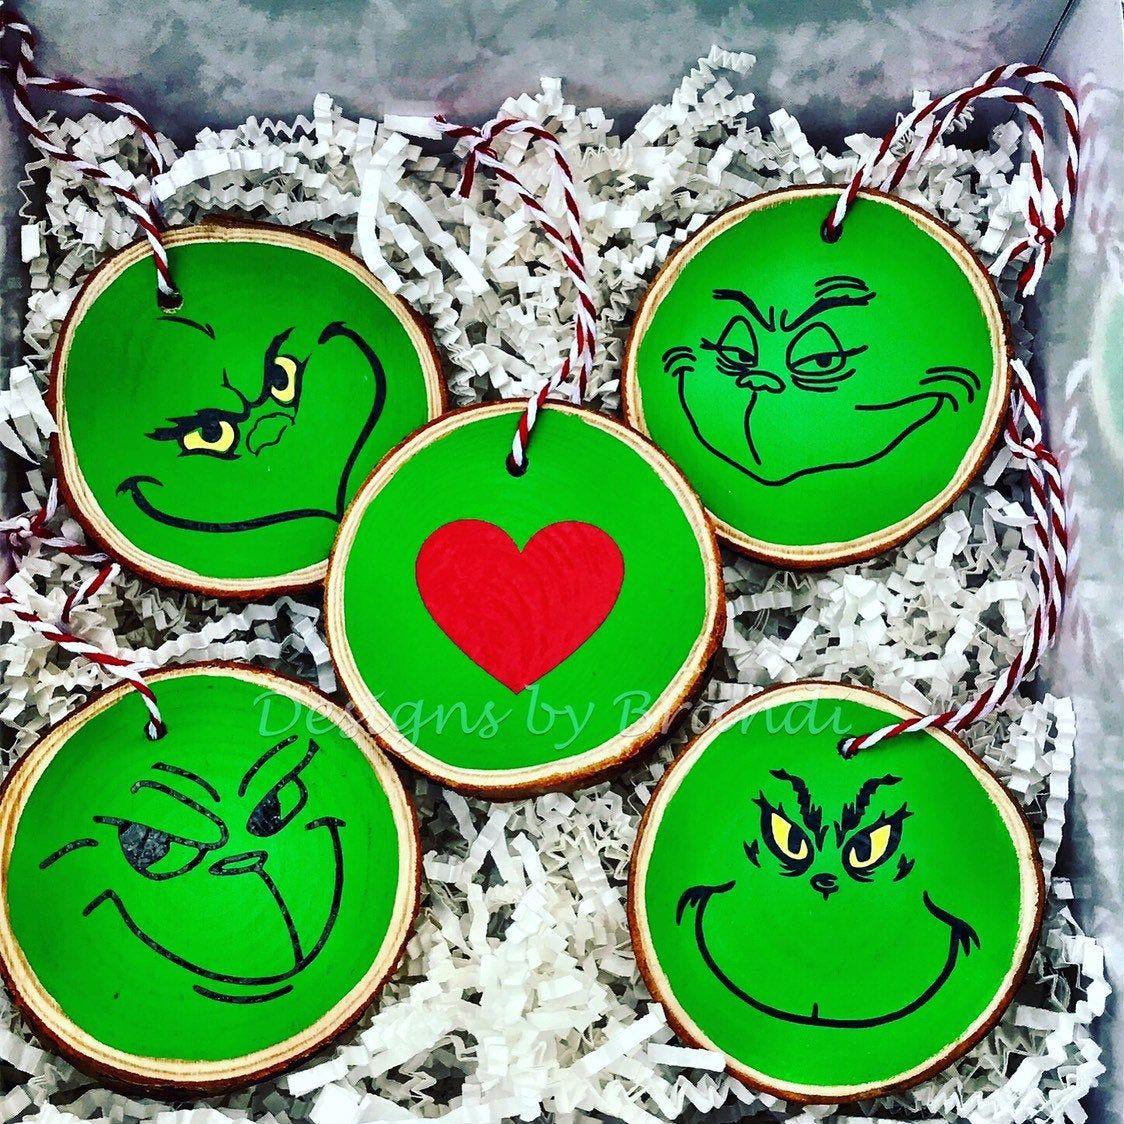 Grinch Christmas Ornaments Grinch Ornaments Mr Grinch Etsy Christmas Ornament Crafts Wood Christmas Ornaments Wooden Christmas Ornaments